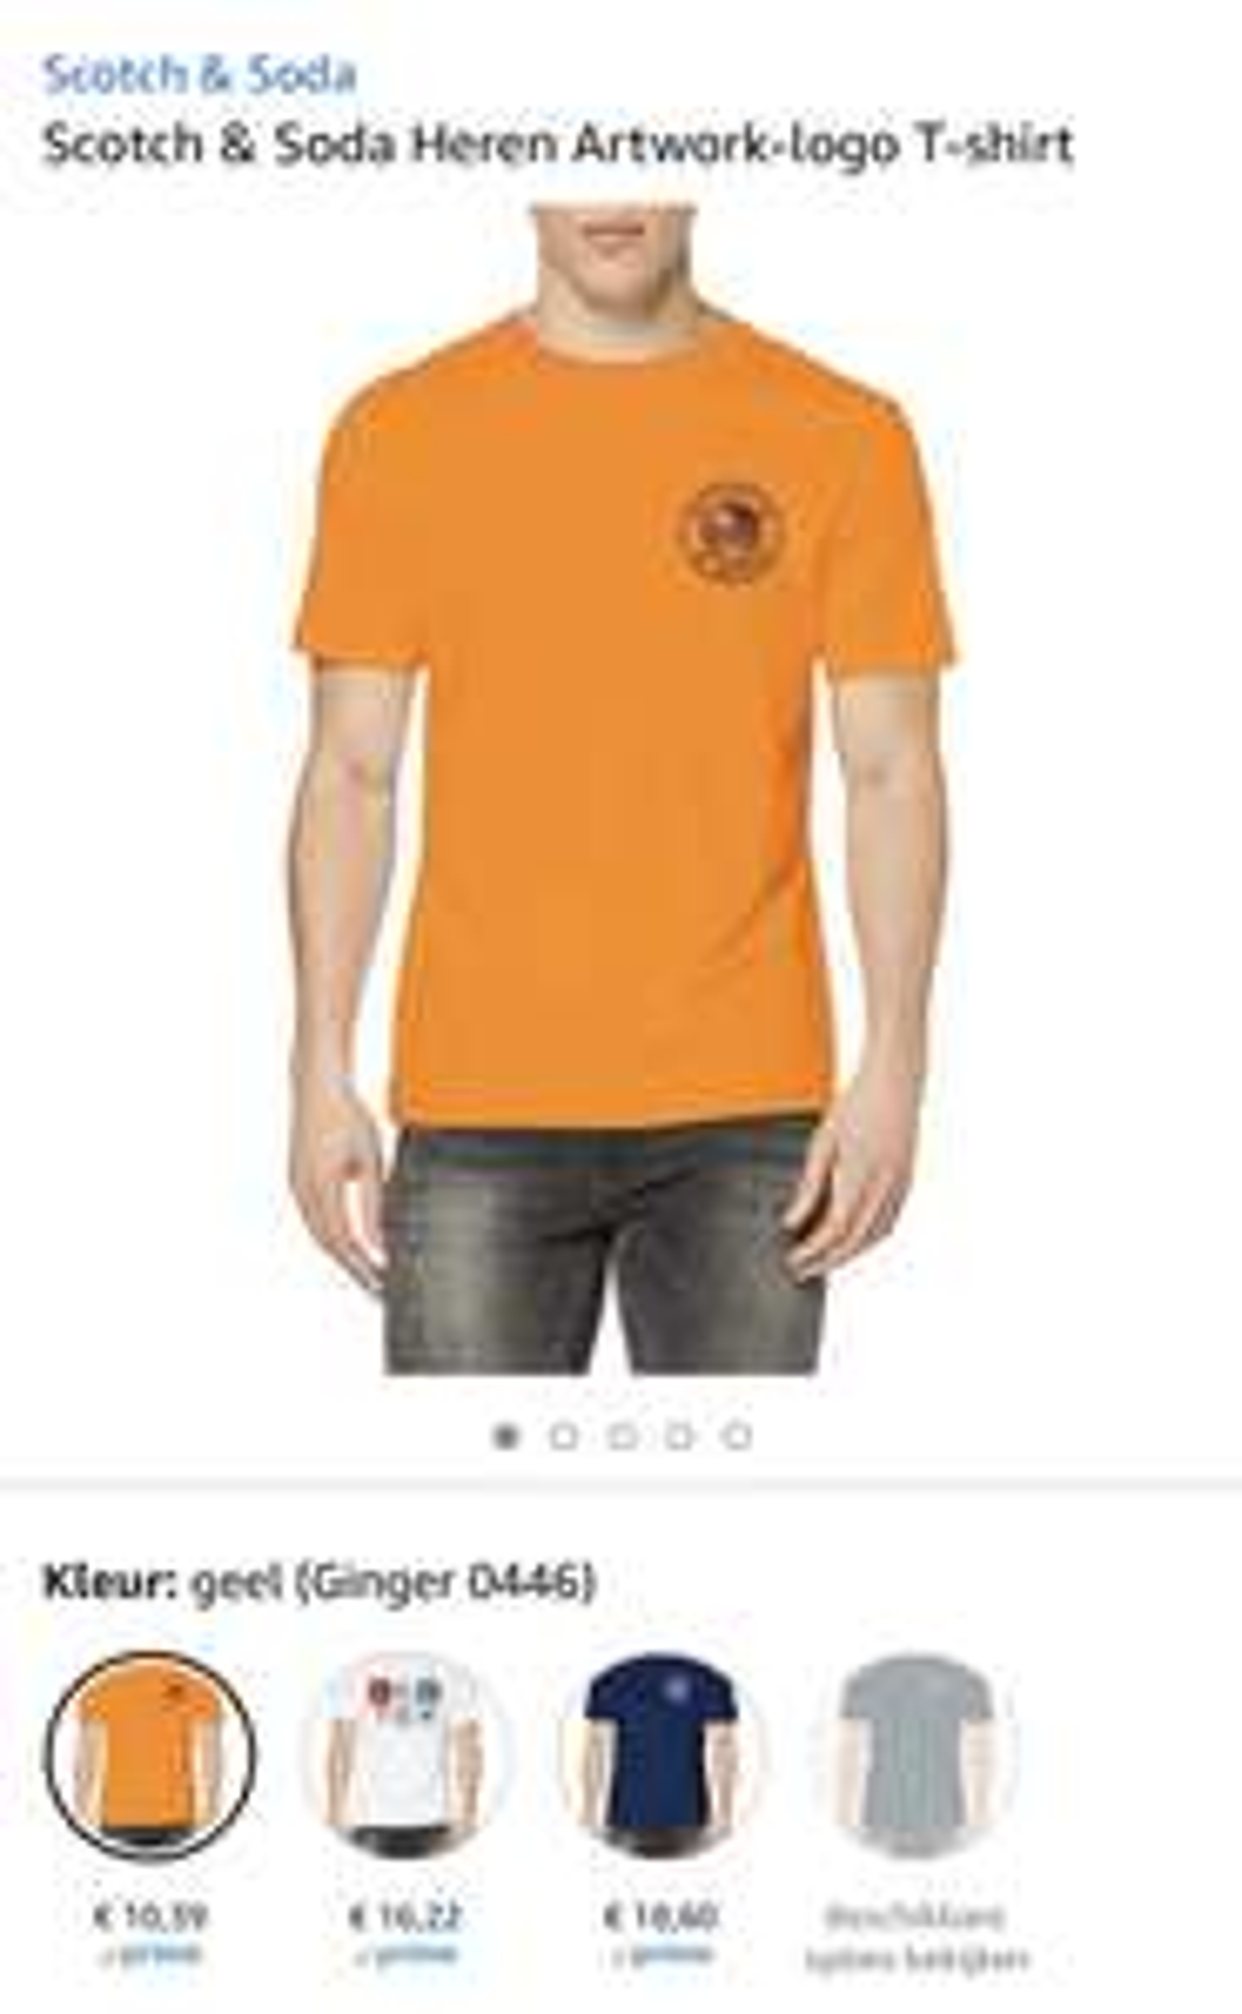 Scotch & Soda Heren T-shirt vanaf €10,39